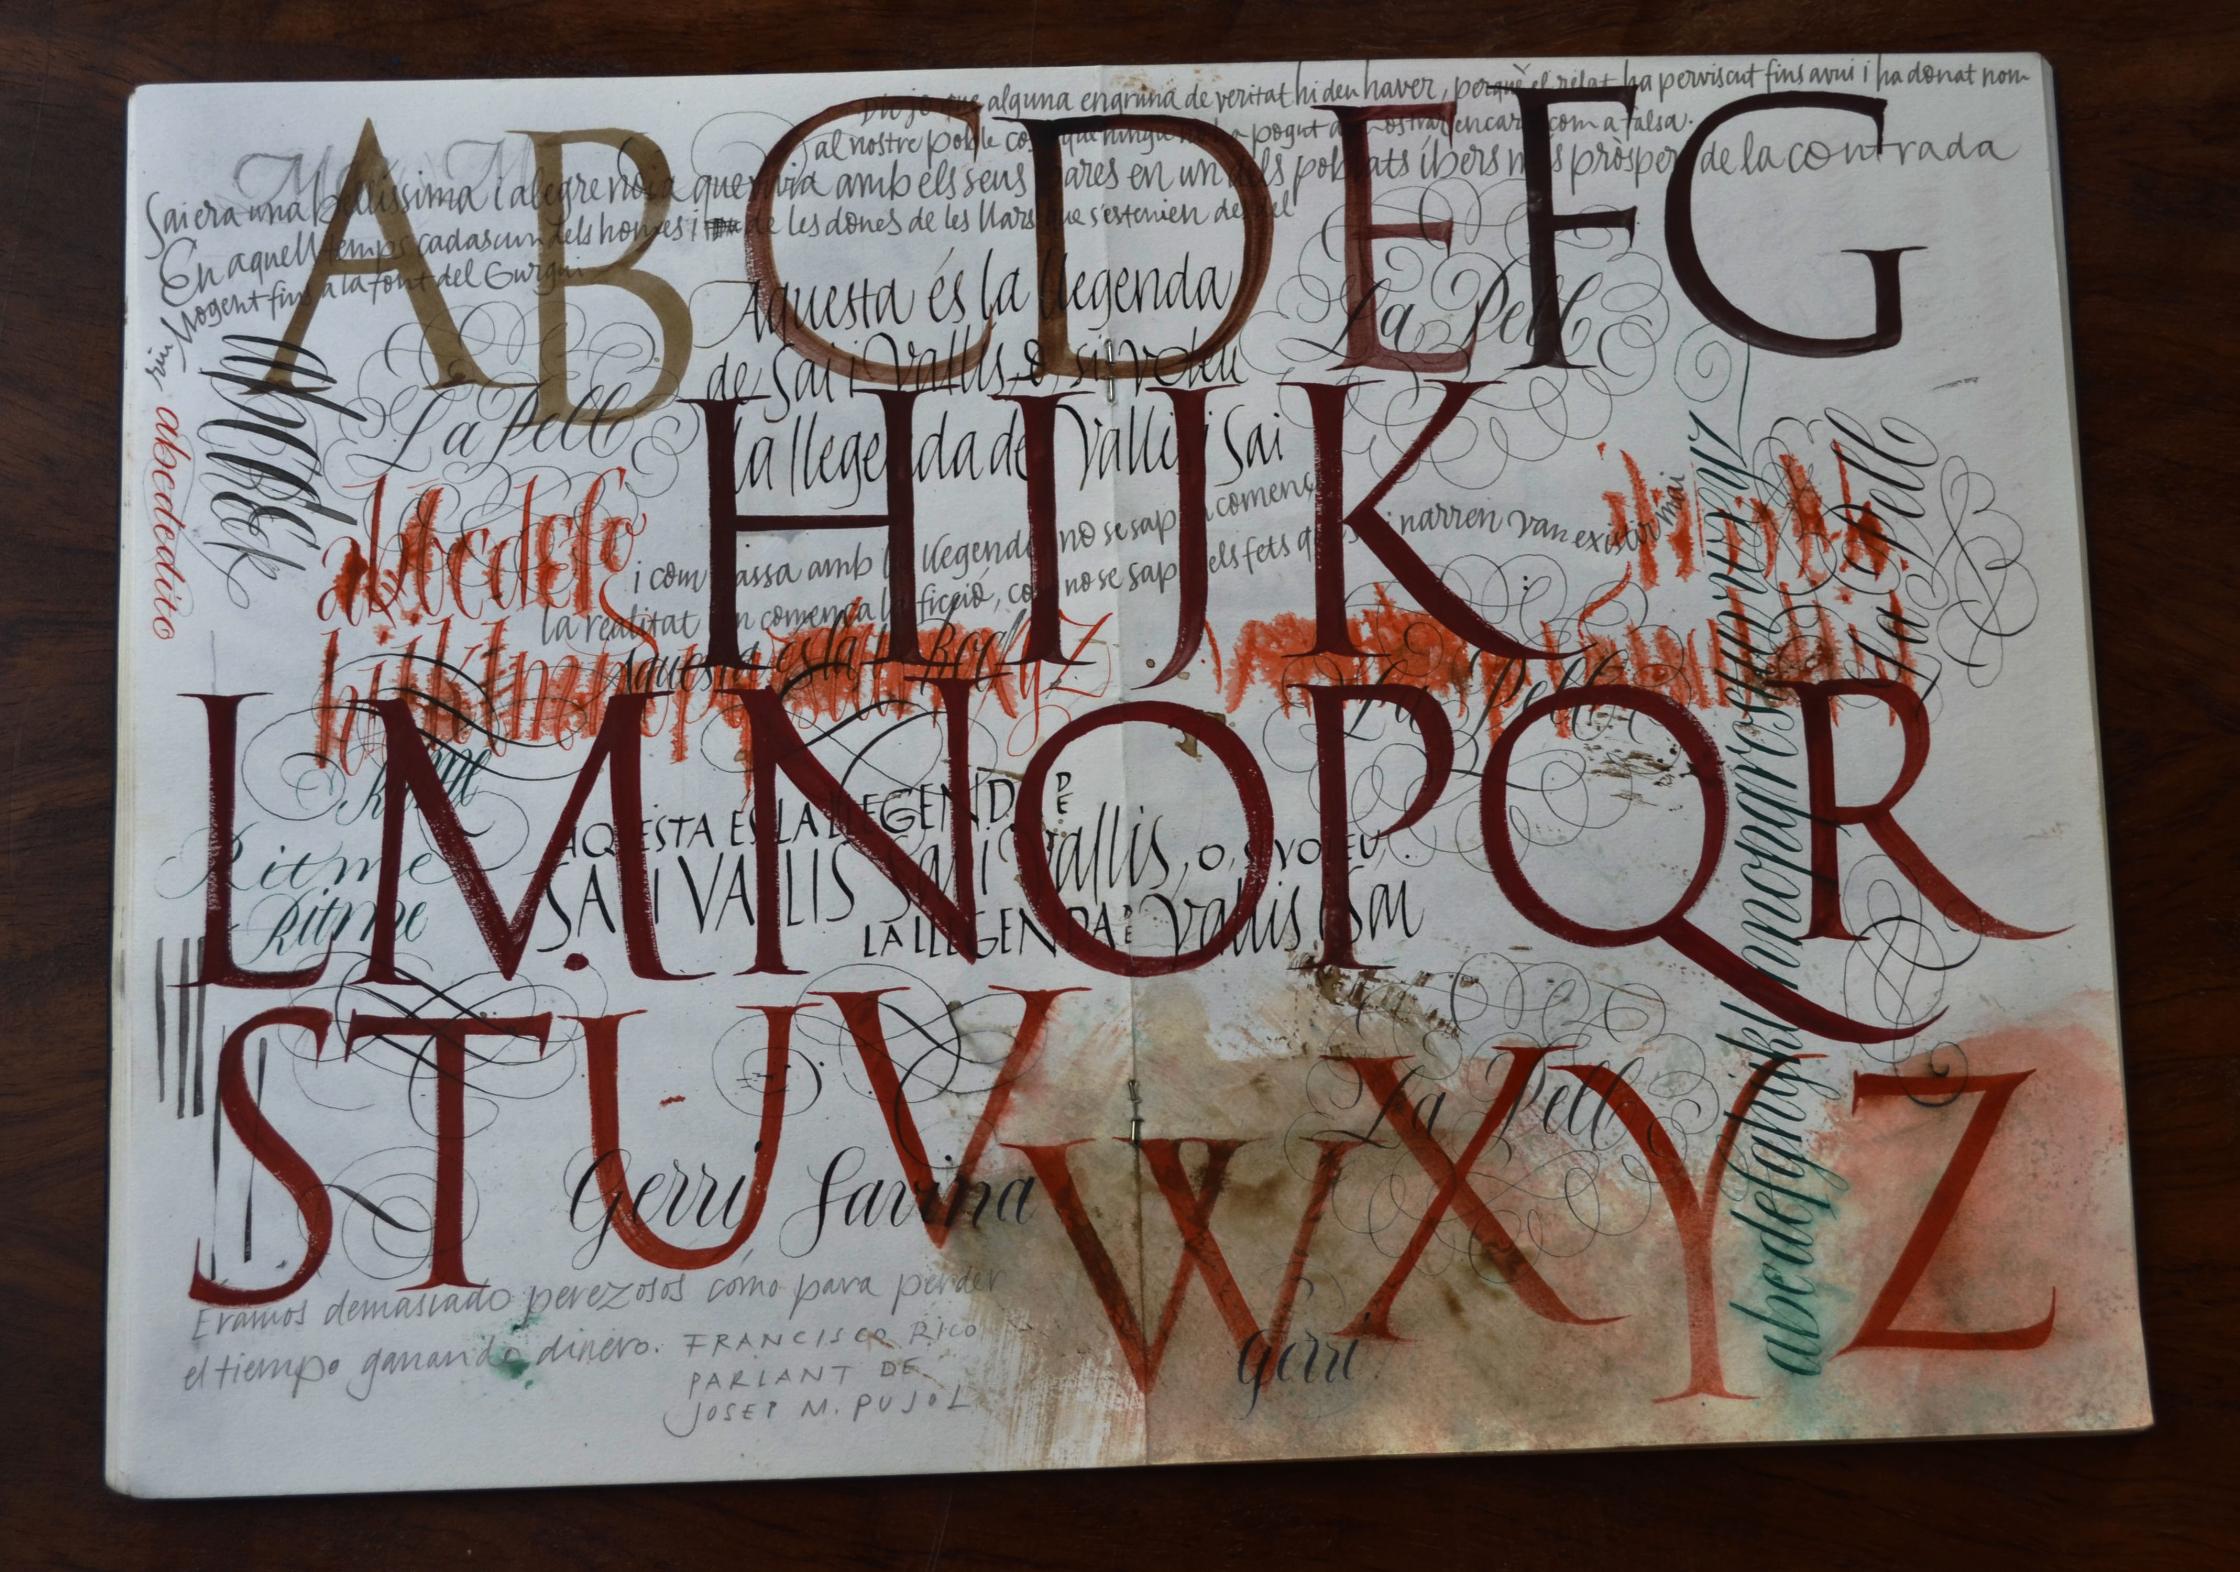 OMG - Oriol Miró i Genovart Alfabet 1 Sketchbook_DSC0011.jpg